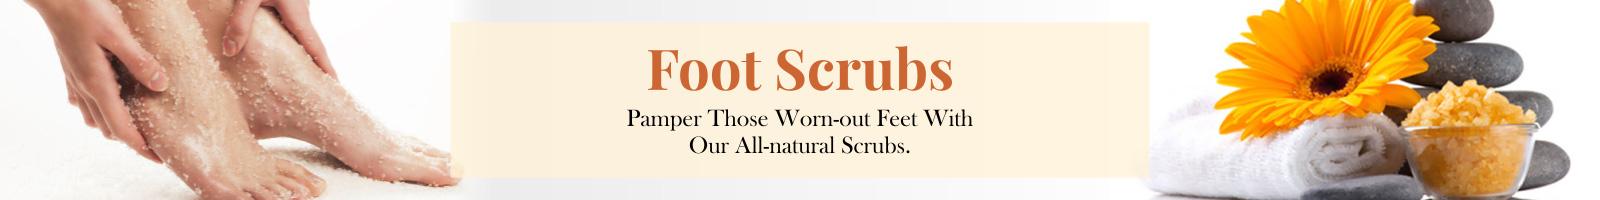 Foot Scrubs & Scrubbers